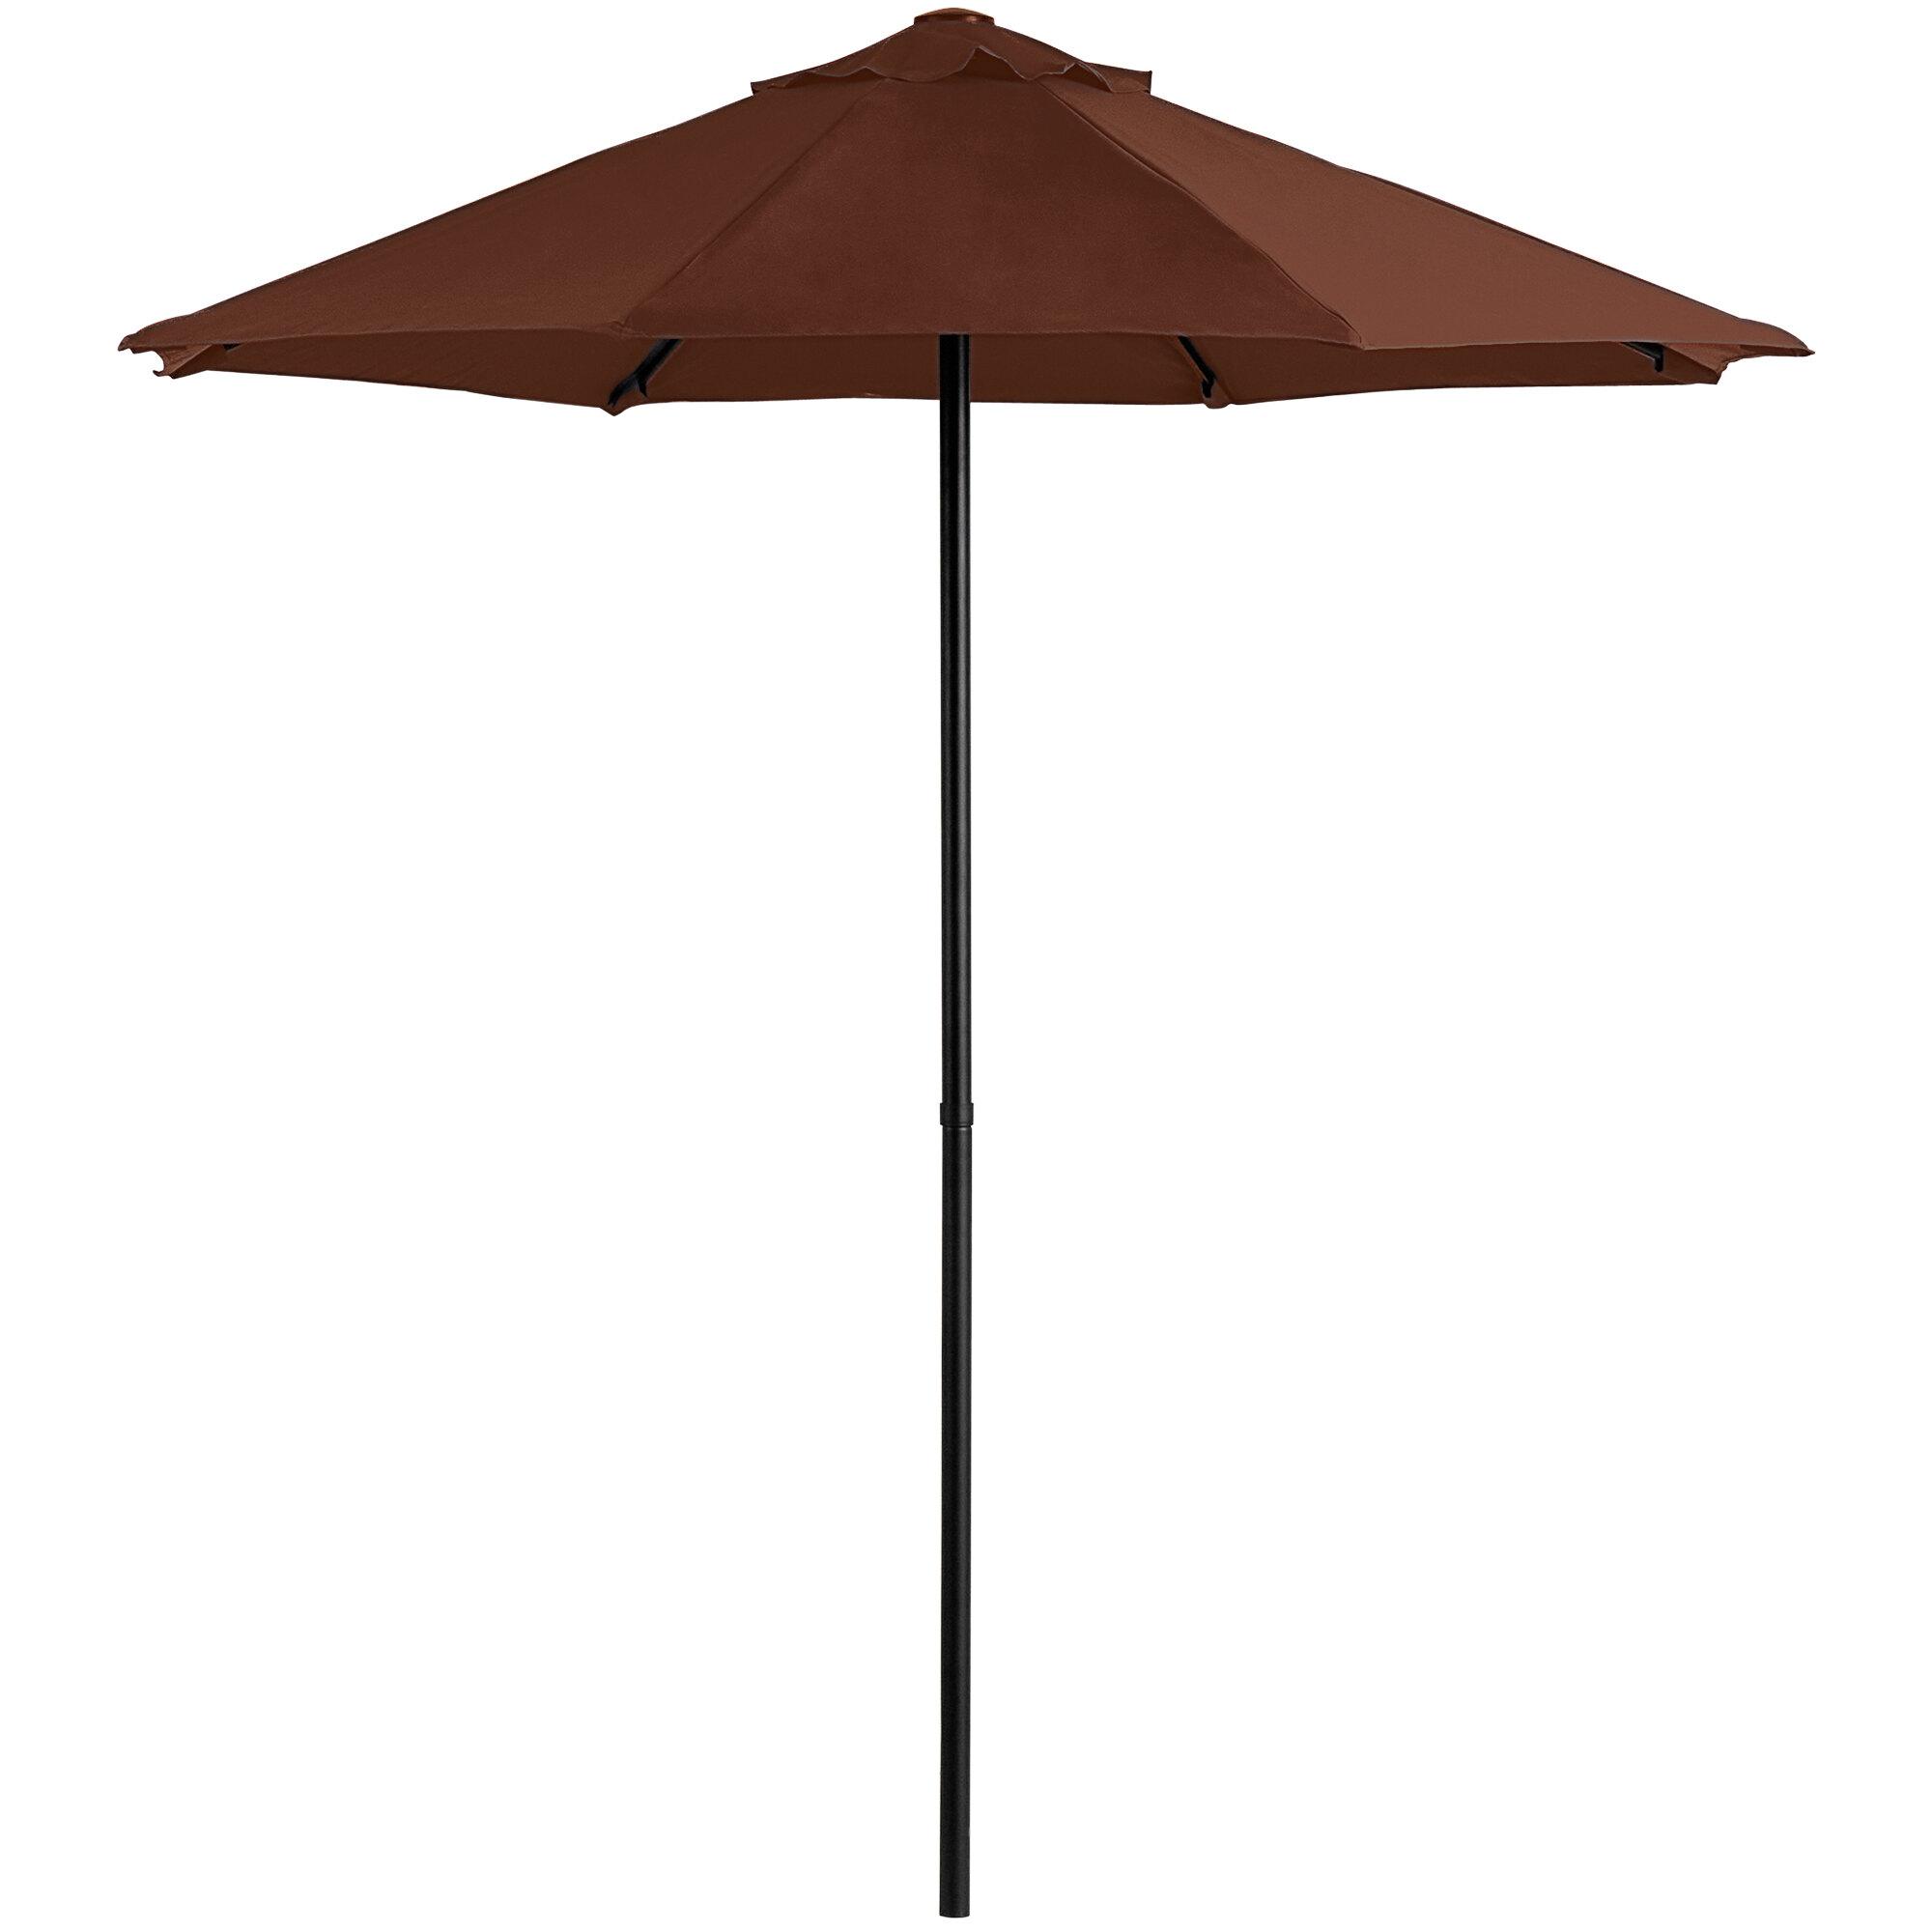 "#80 - 7 1/2 FT Round Terracotta Push Lift Umbrella with 1 1/2"" Steel Pole"